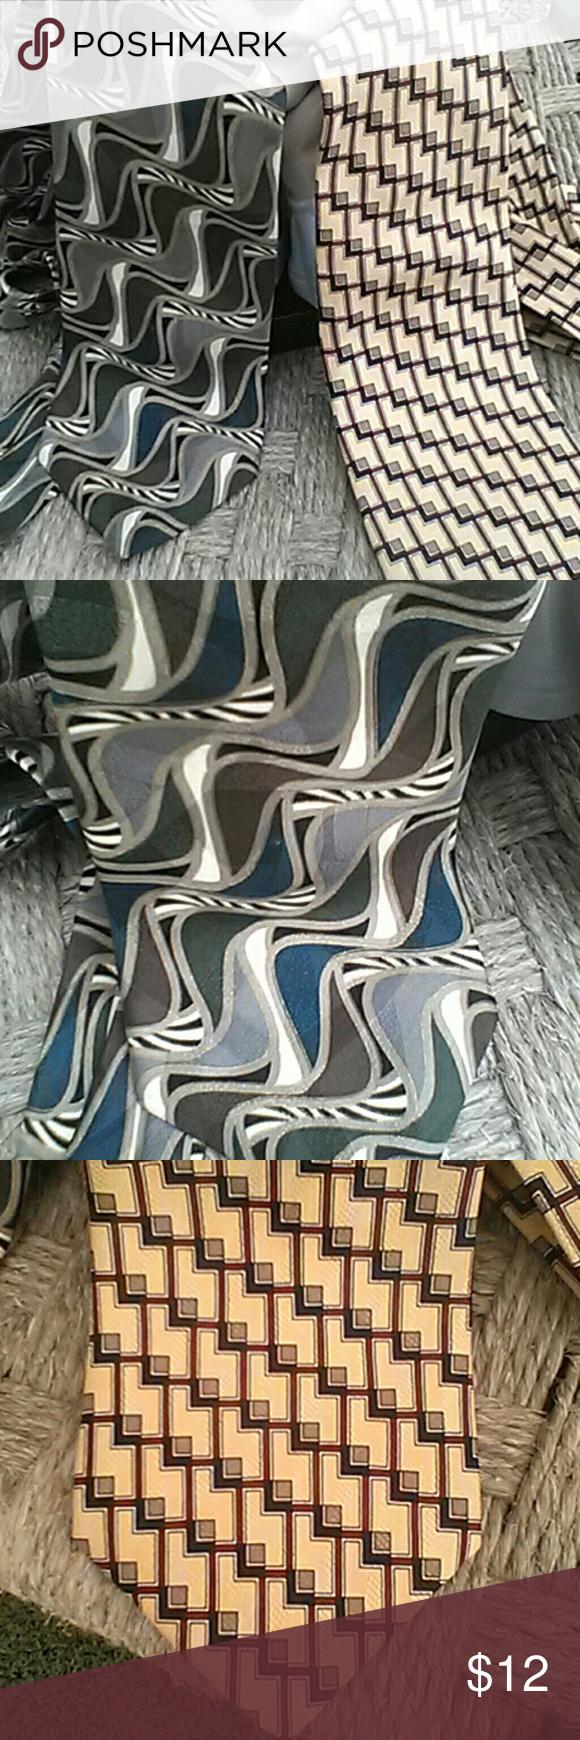 Silk Tie Bundle 2 for 1 Silk Tie x 2 Accessories Ties